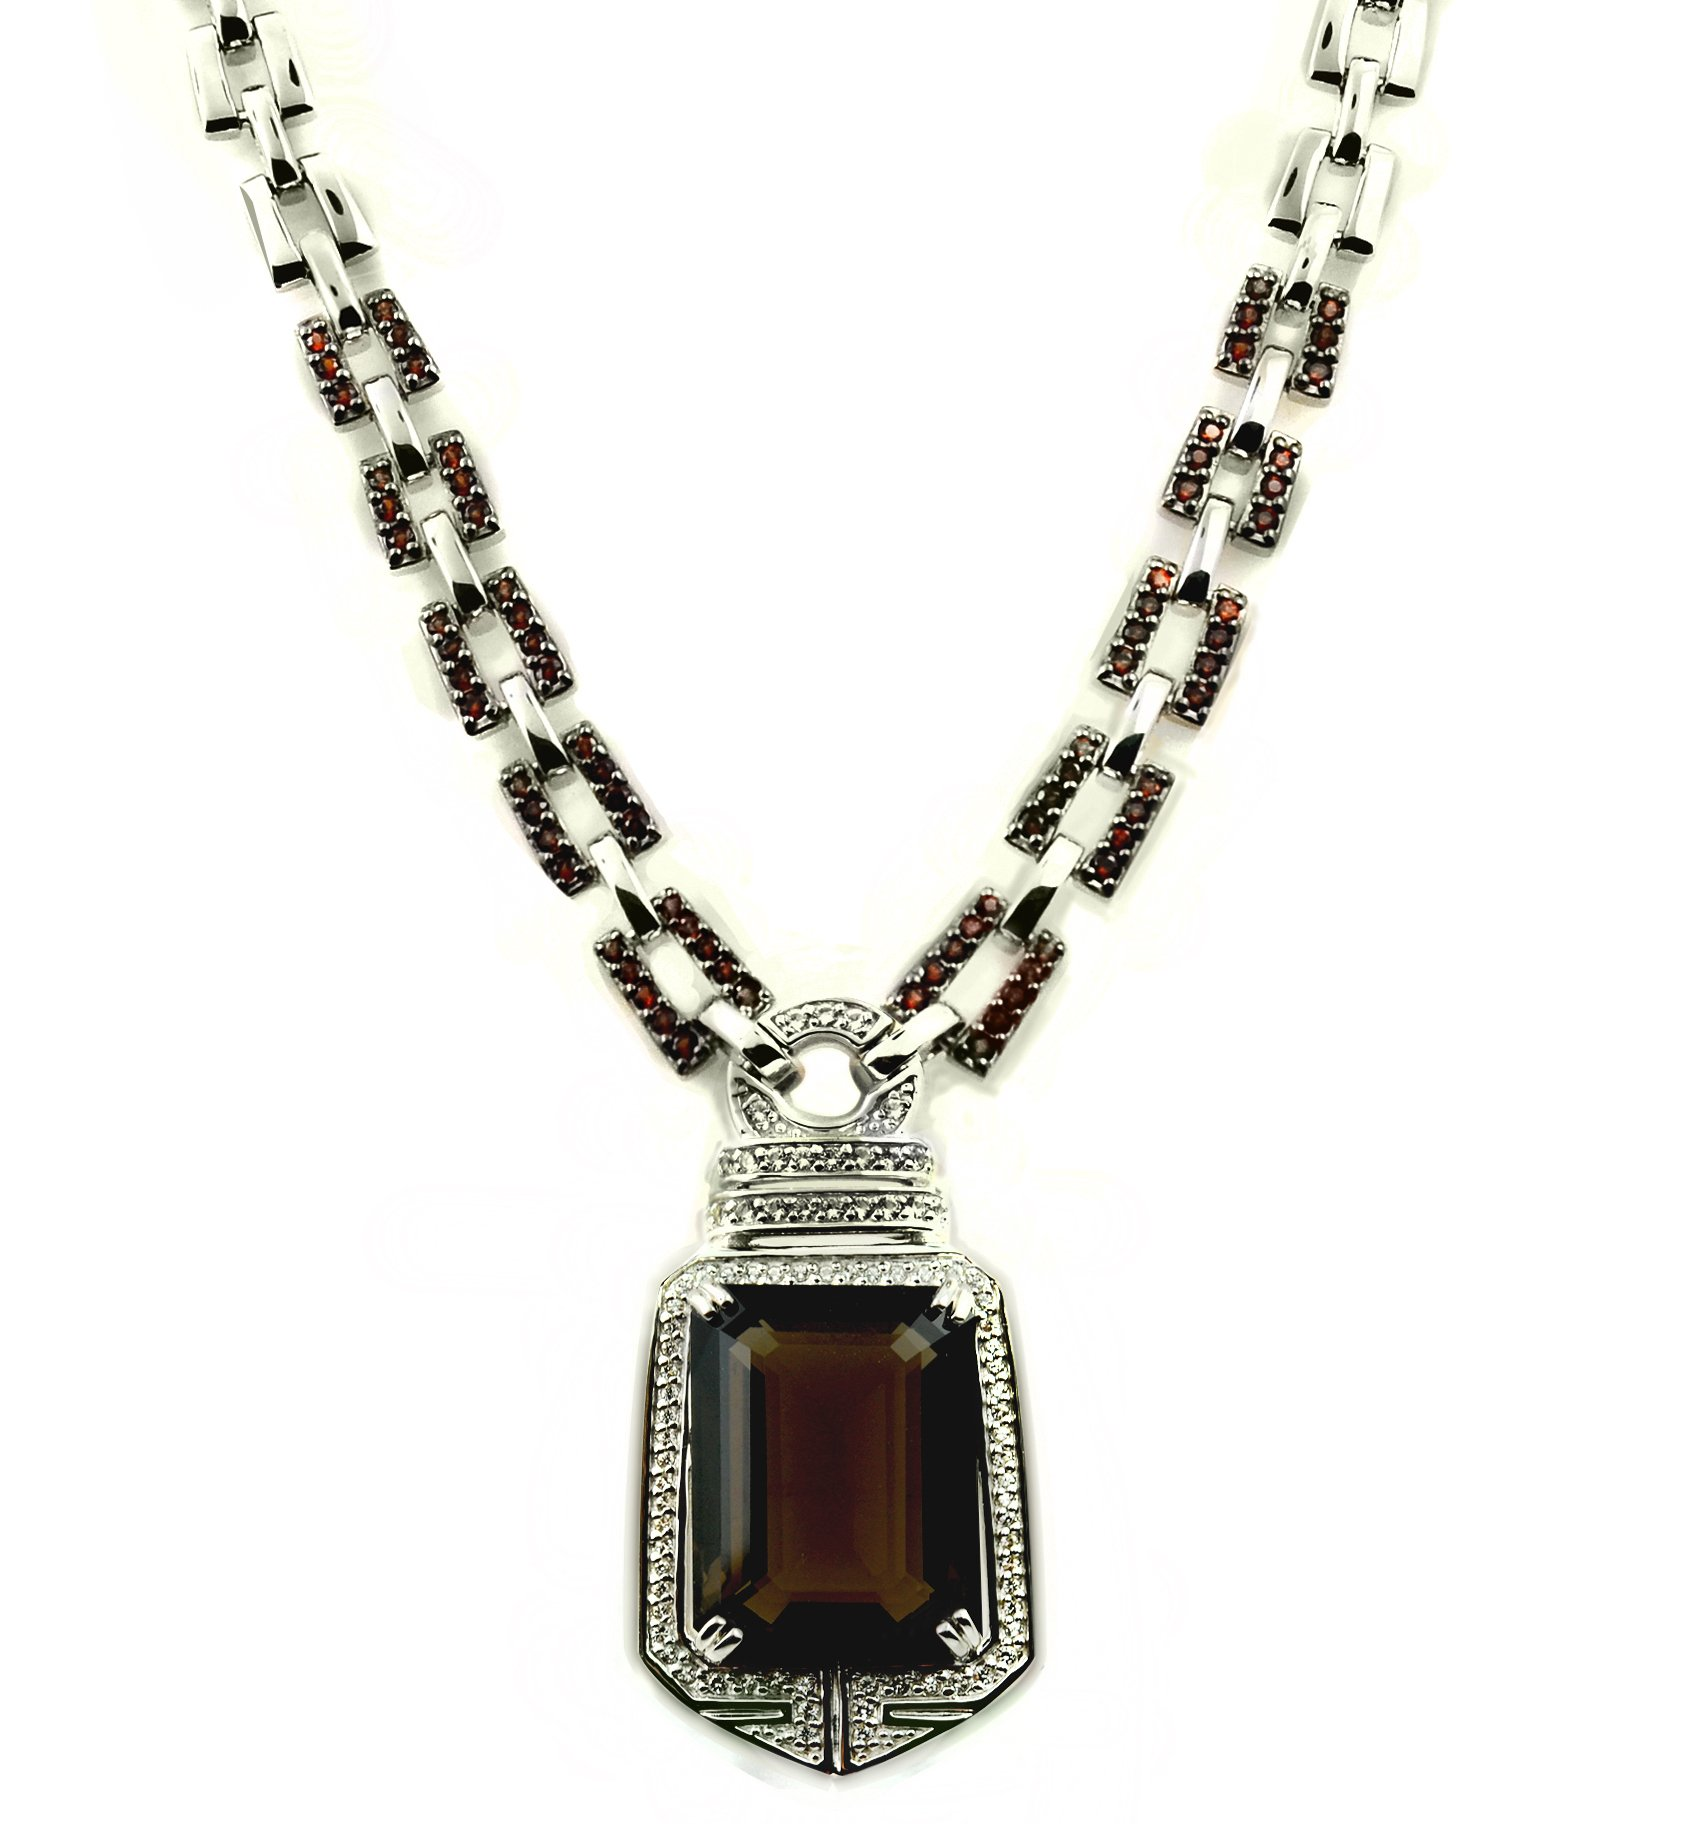 RB Gems Sterling Silver 925 STATEMENT Pendant Necklace GENUINE GEMSTONE 24 mm with RHODIUM-PLATED Finish (smoky-quartz)